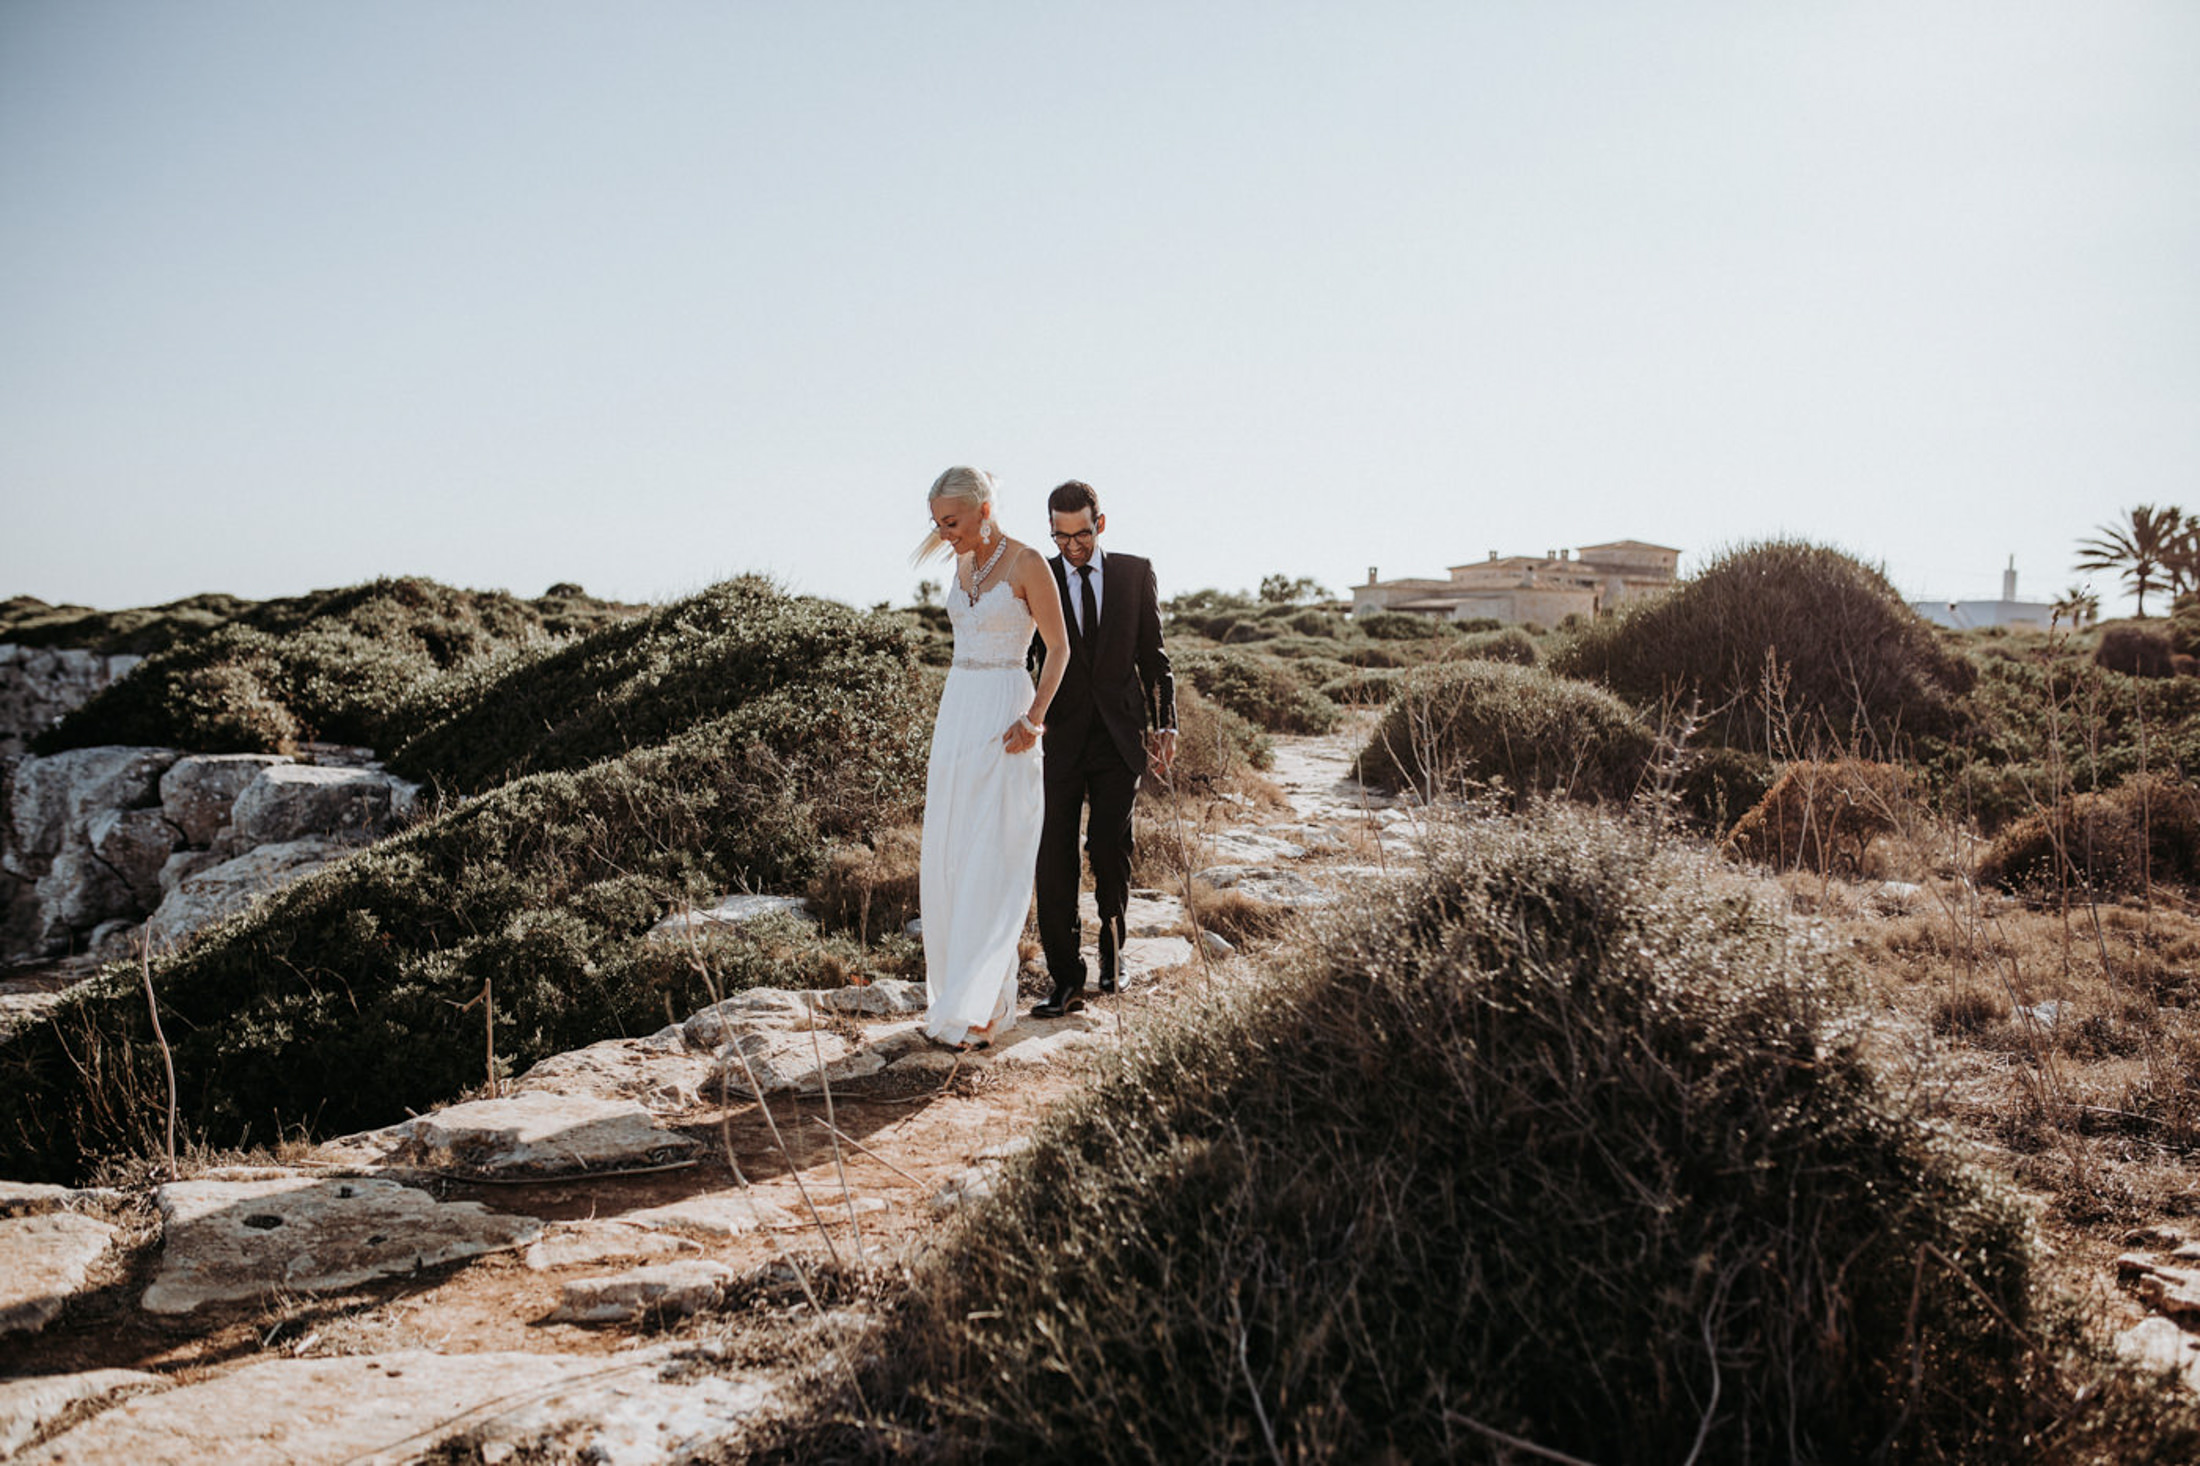 Wedding_Photographer_Mallorca_Daniela-Marquardt_Photography_New_York_Iceland_Tuscany_Santorini_Portugal_Austria_Bavaria_Elopement_Hochzeitsfotograf_AntjeRajat2_77